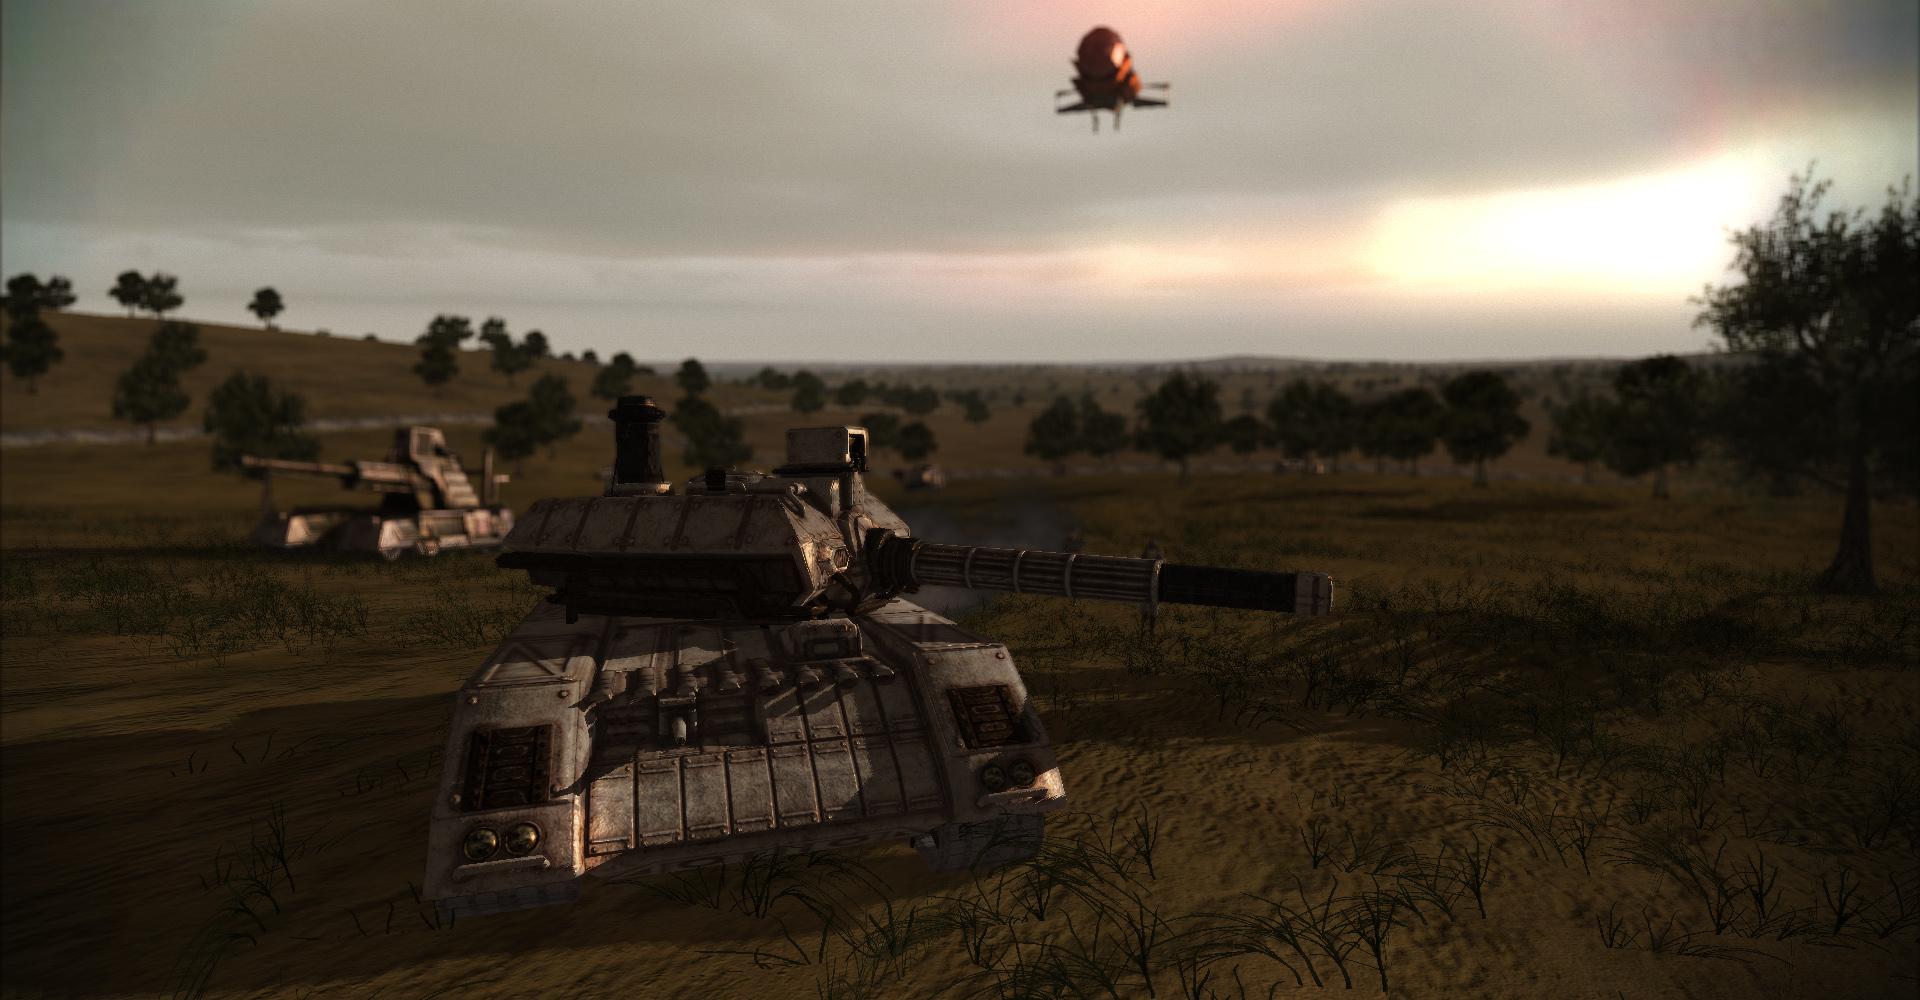 Gettysburg_Armored_Warfare_Tank.jpg